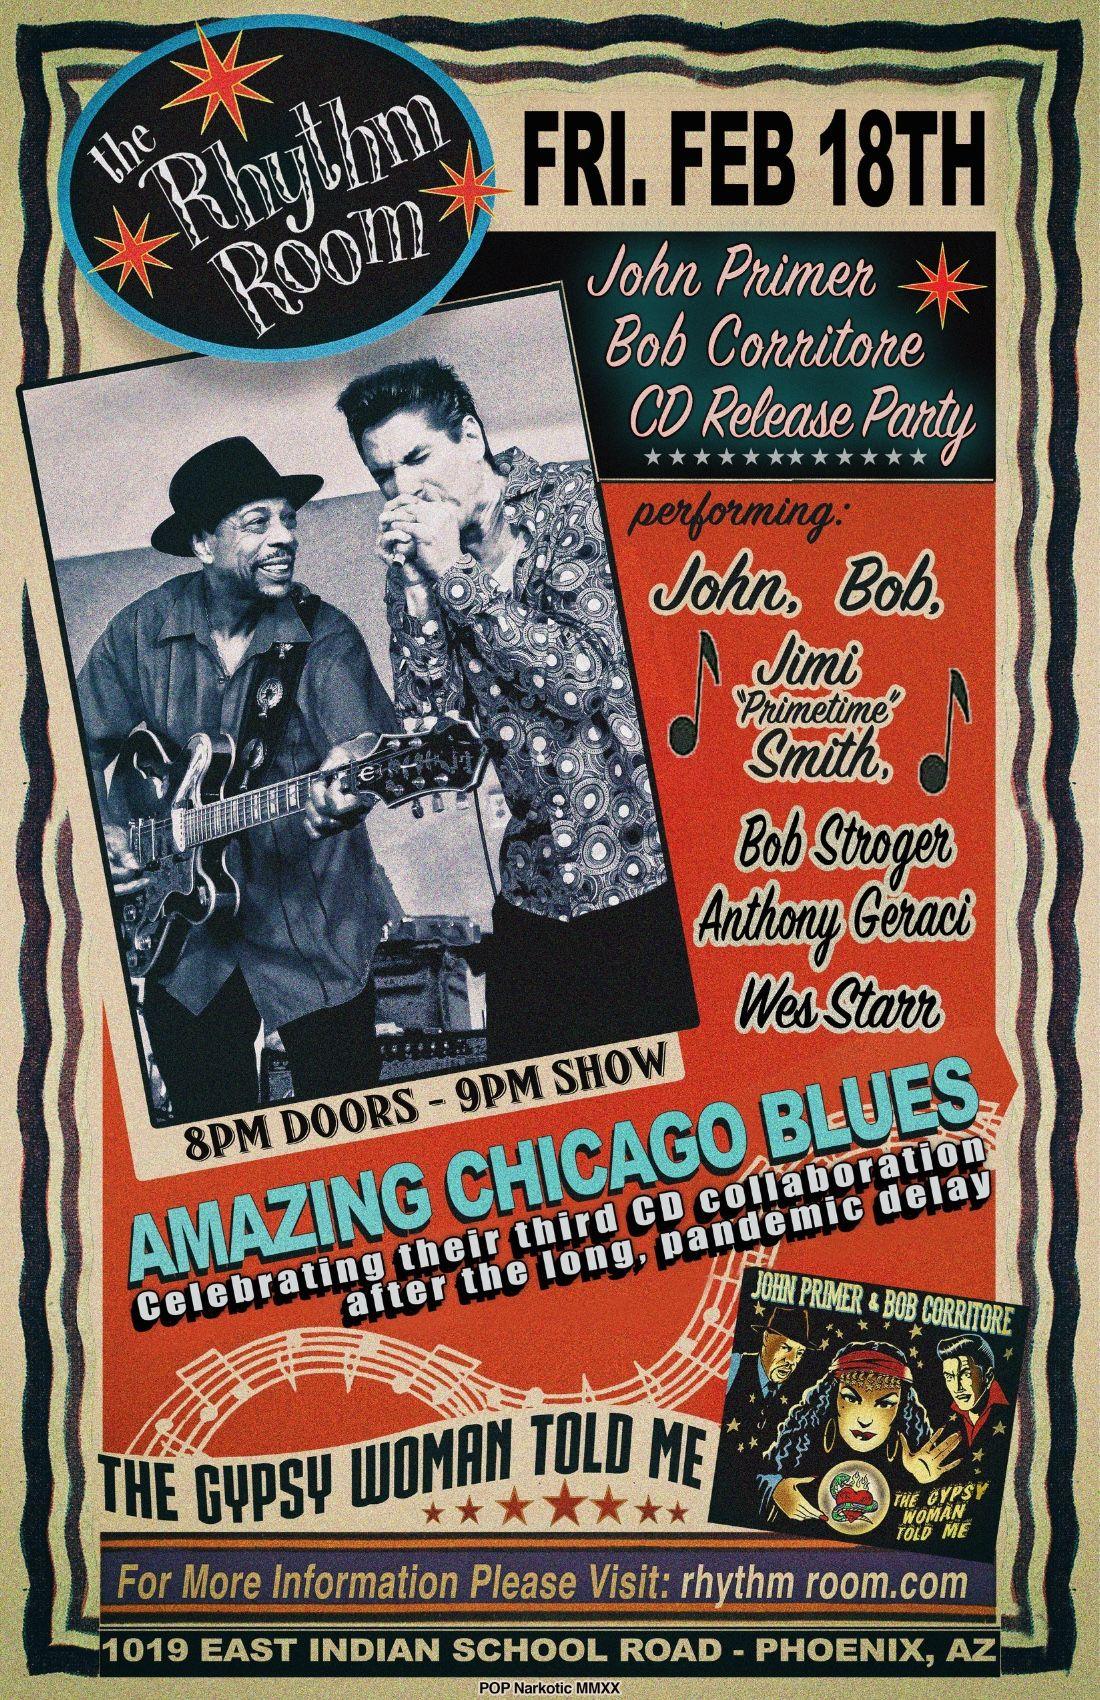 John Primer/Bob Corritore CD Release Party: